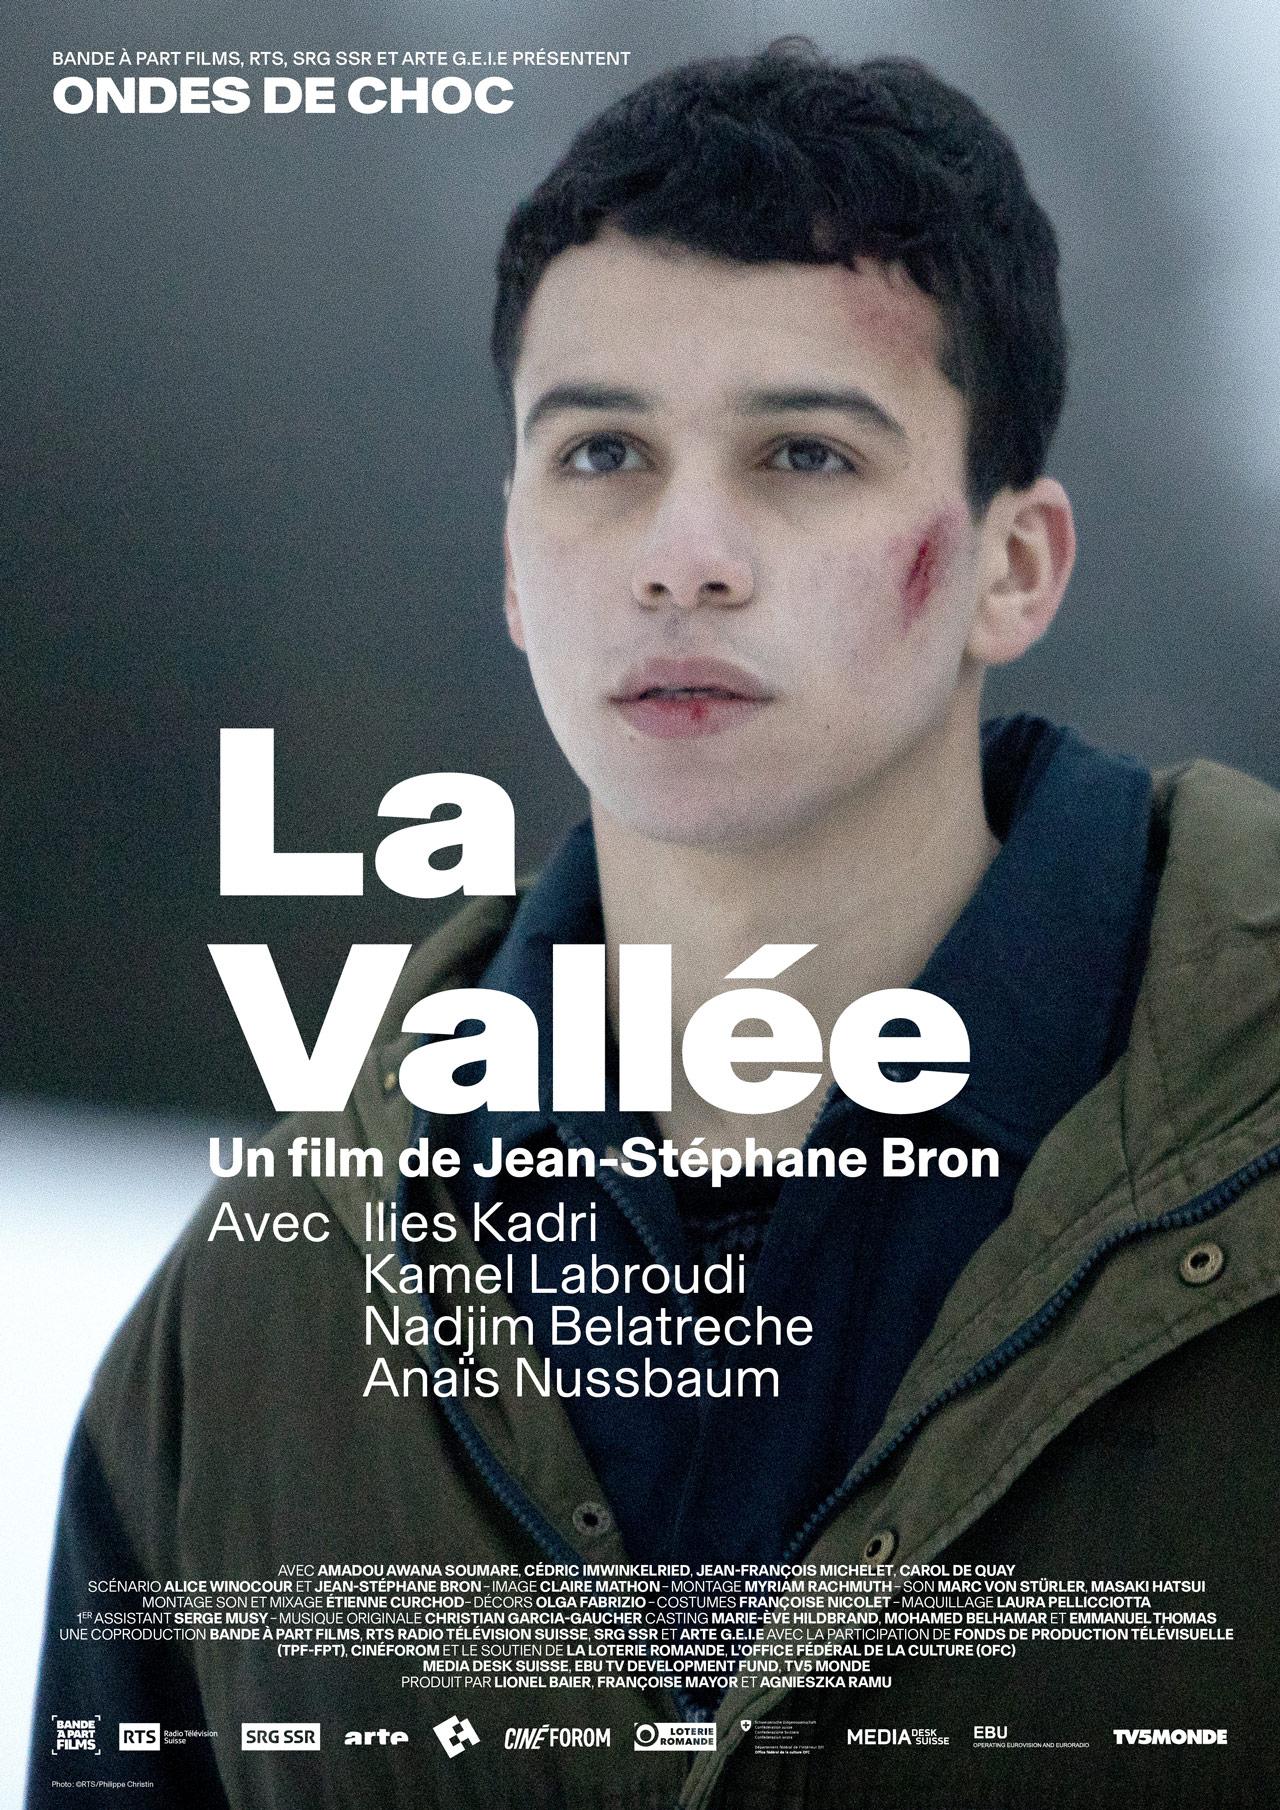 Ondes de choc [1] : La vallée, Bron, Jean-Stéphane